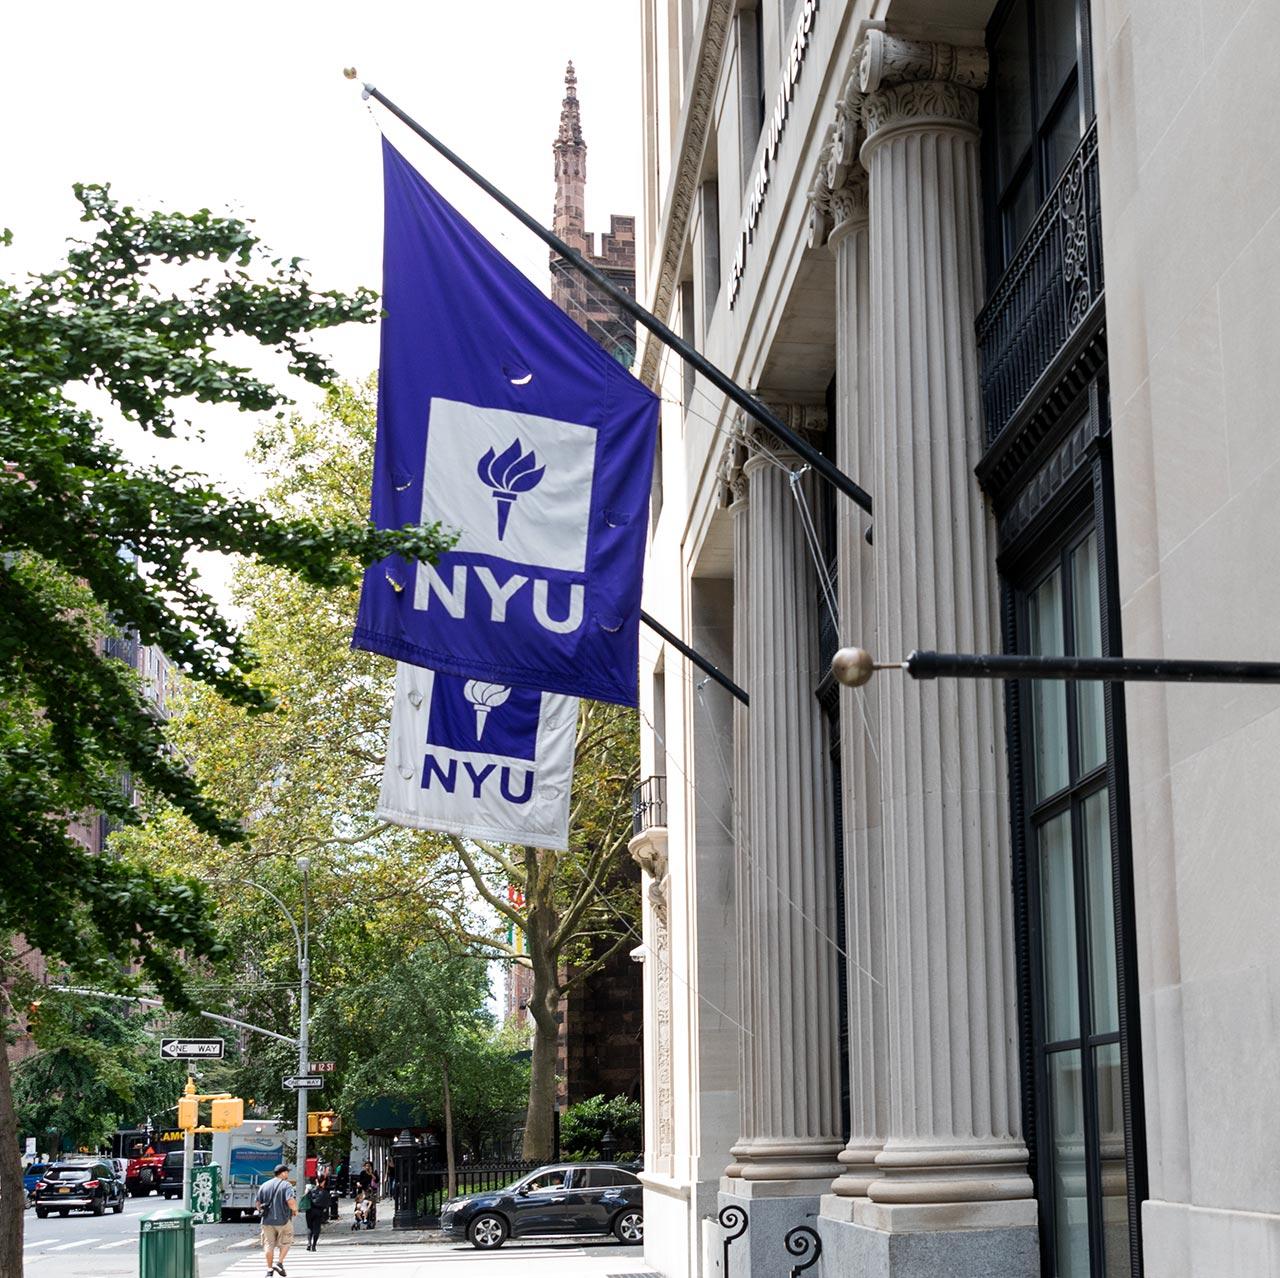 an NYU flag hangs outside of a building